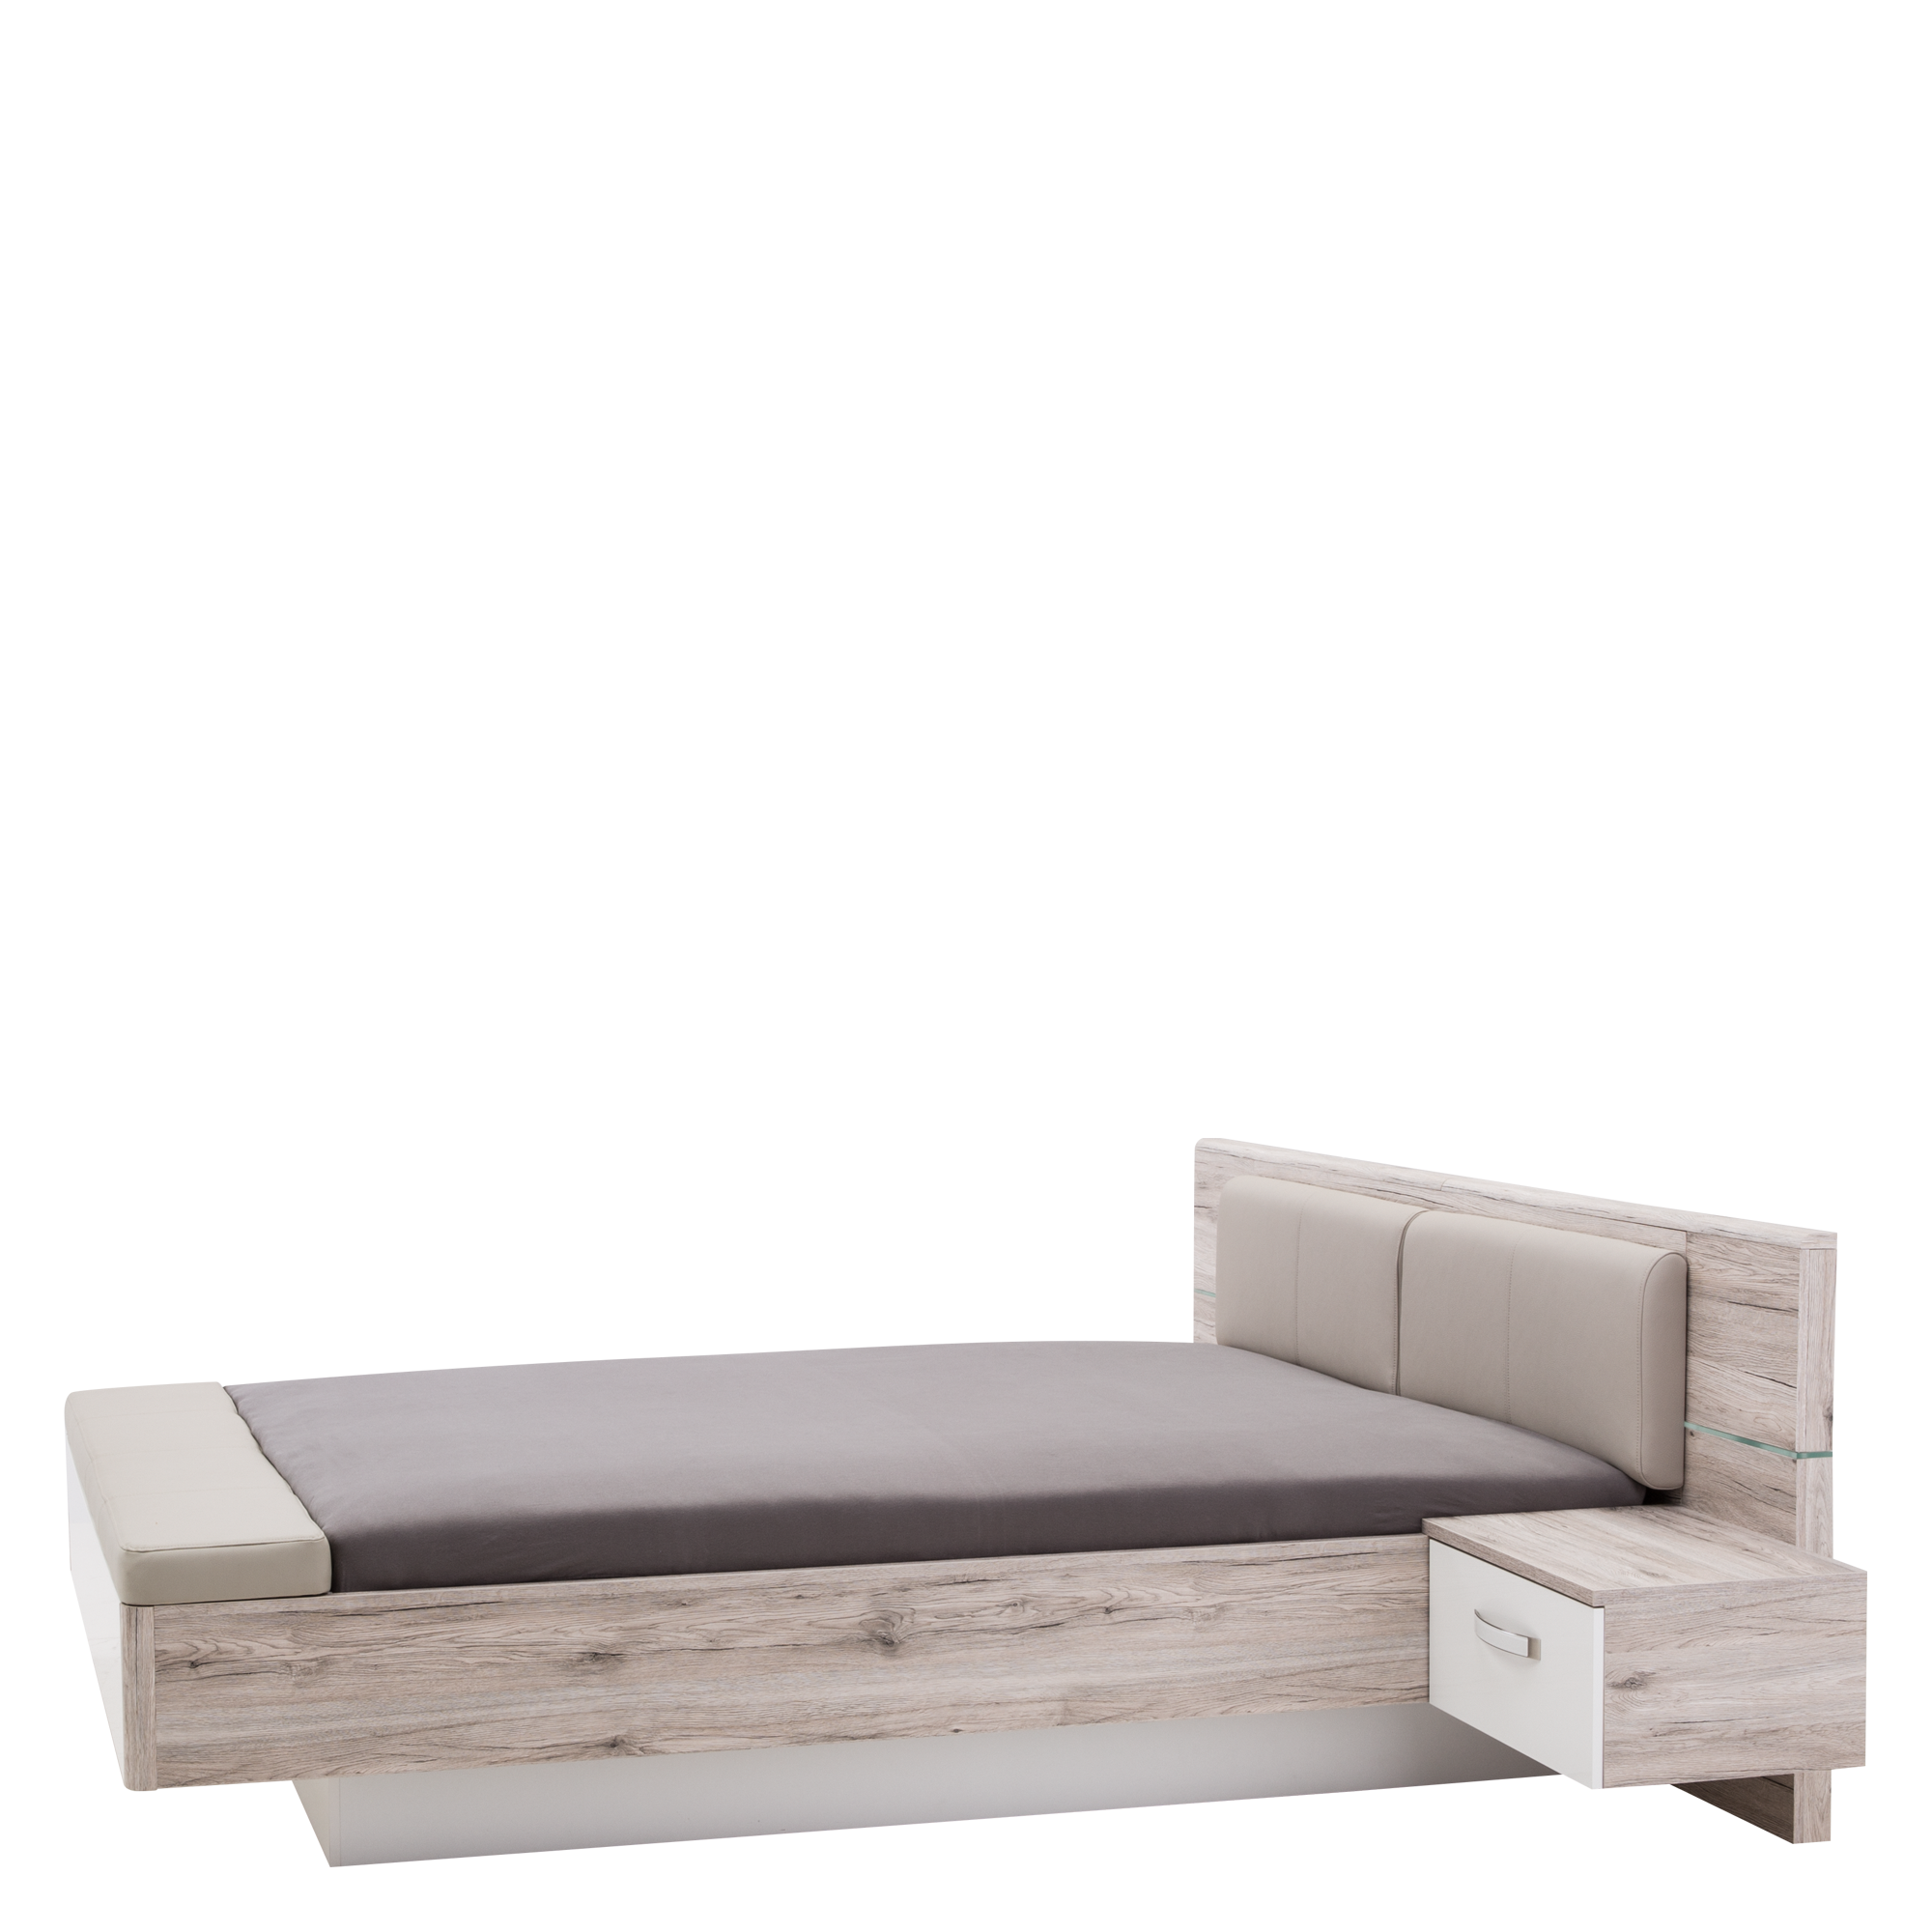 łóżko I Szafki Nocne Rondino Rdnl161b Salony Agata